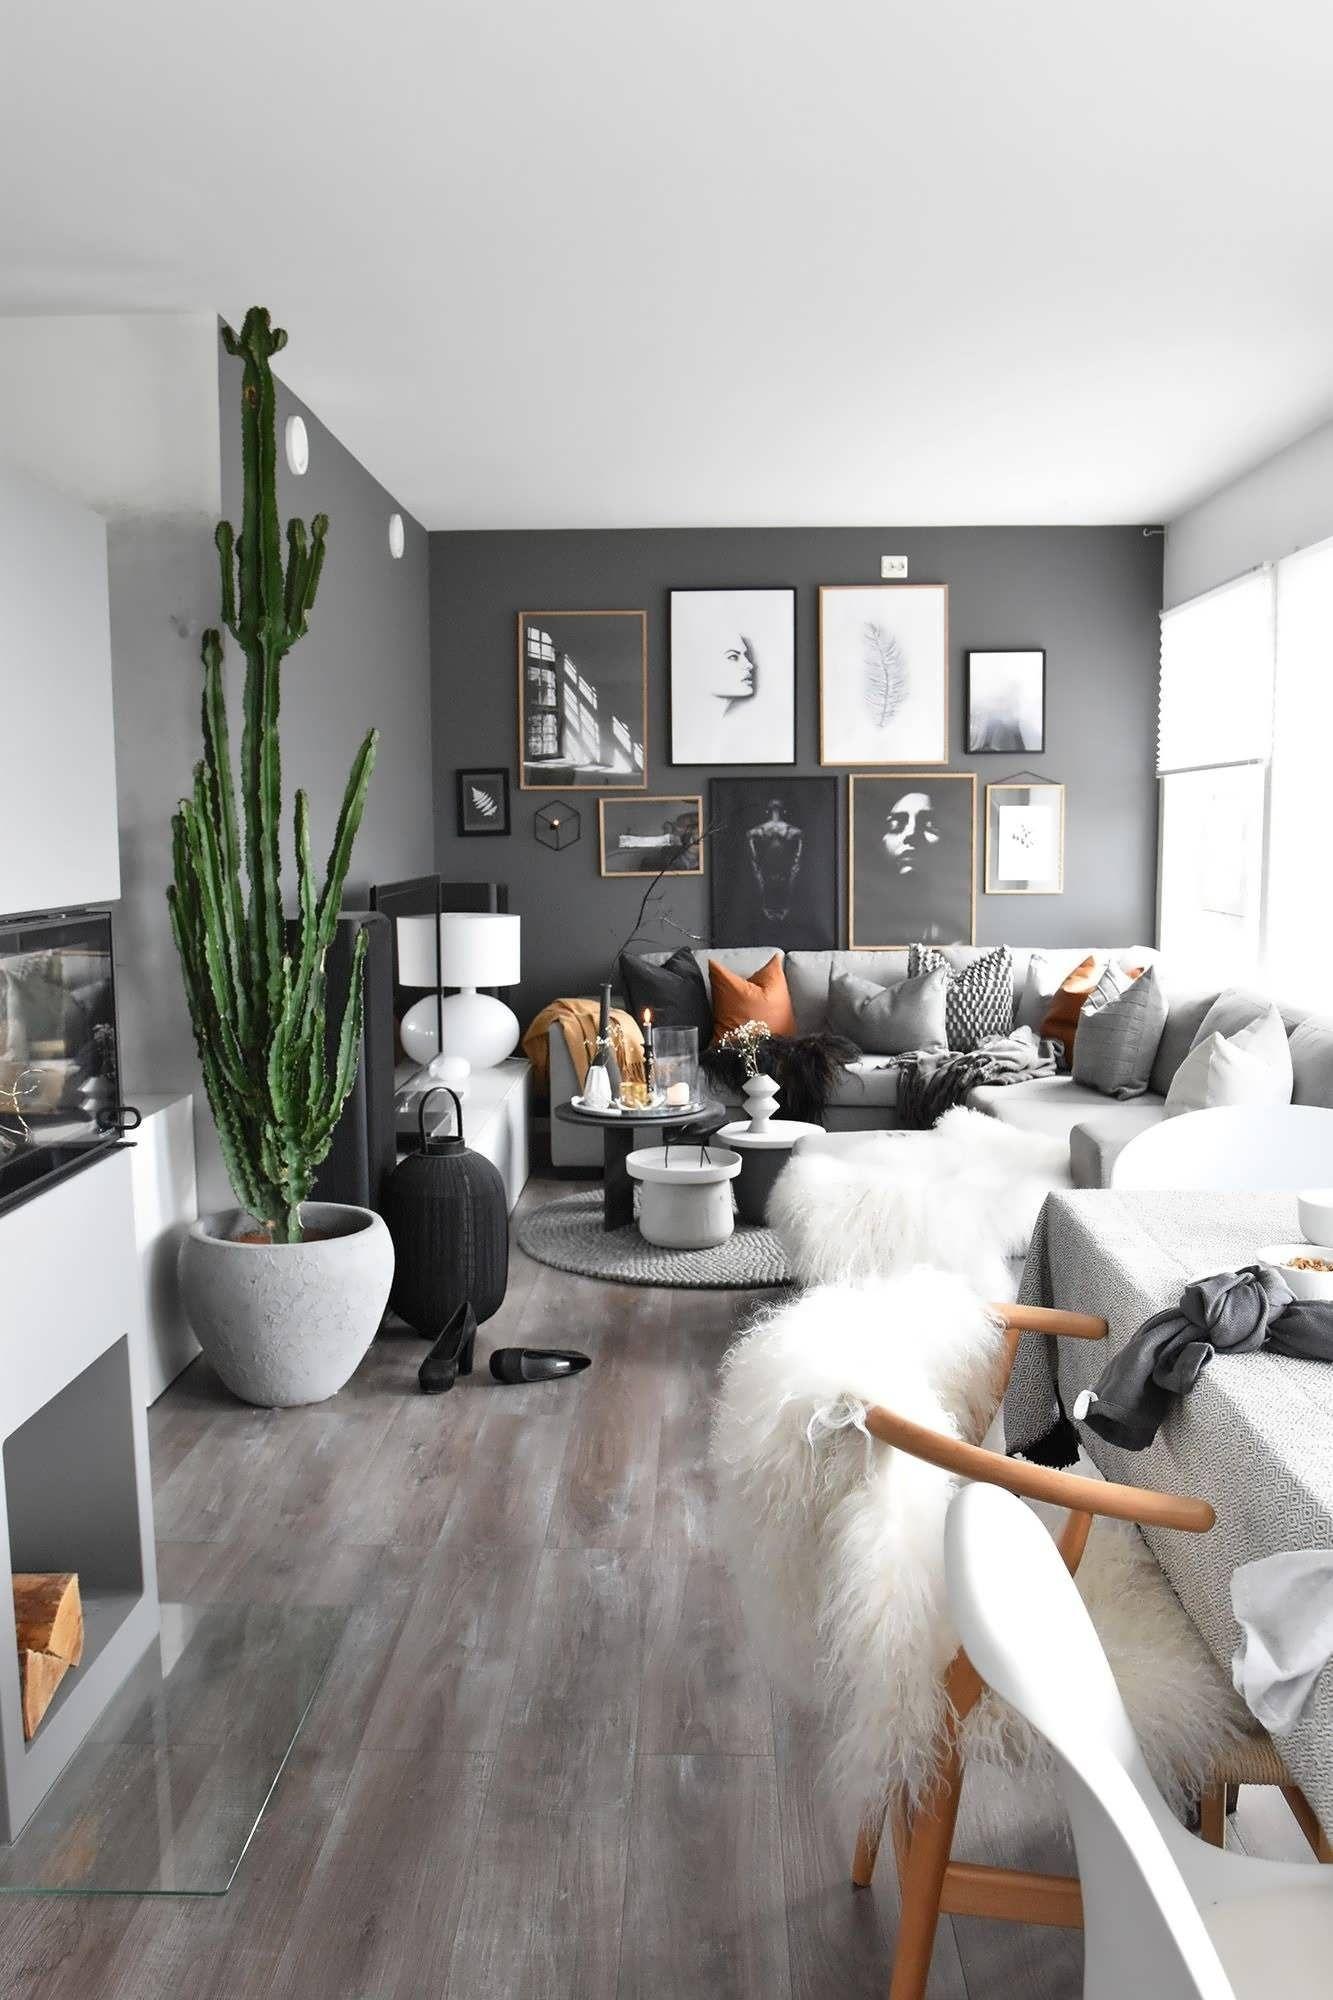 6 Easy Modern Grey Living Room Ideas 10 Black Walls Living Room Dark Grey Living Room Living Room Grey #small #modern #living #room #designs